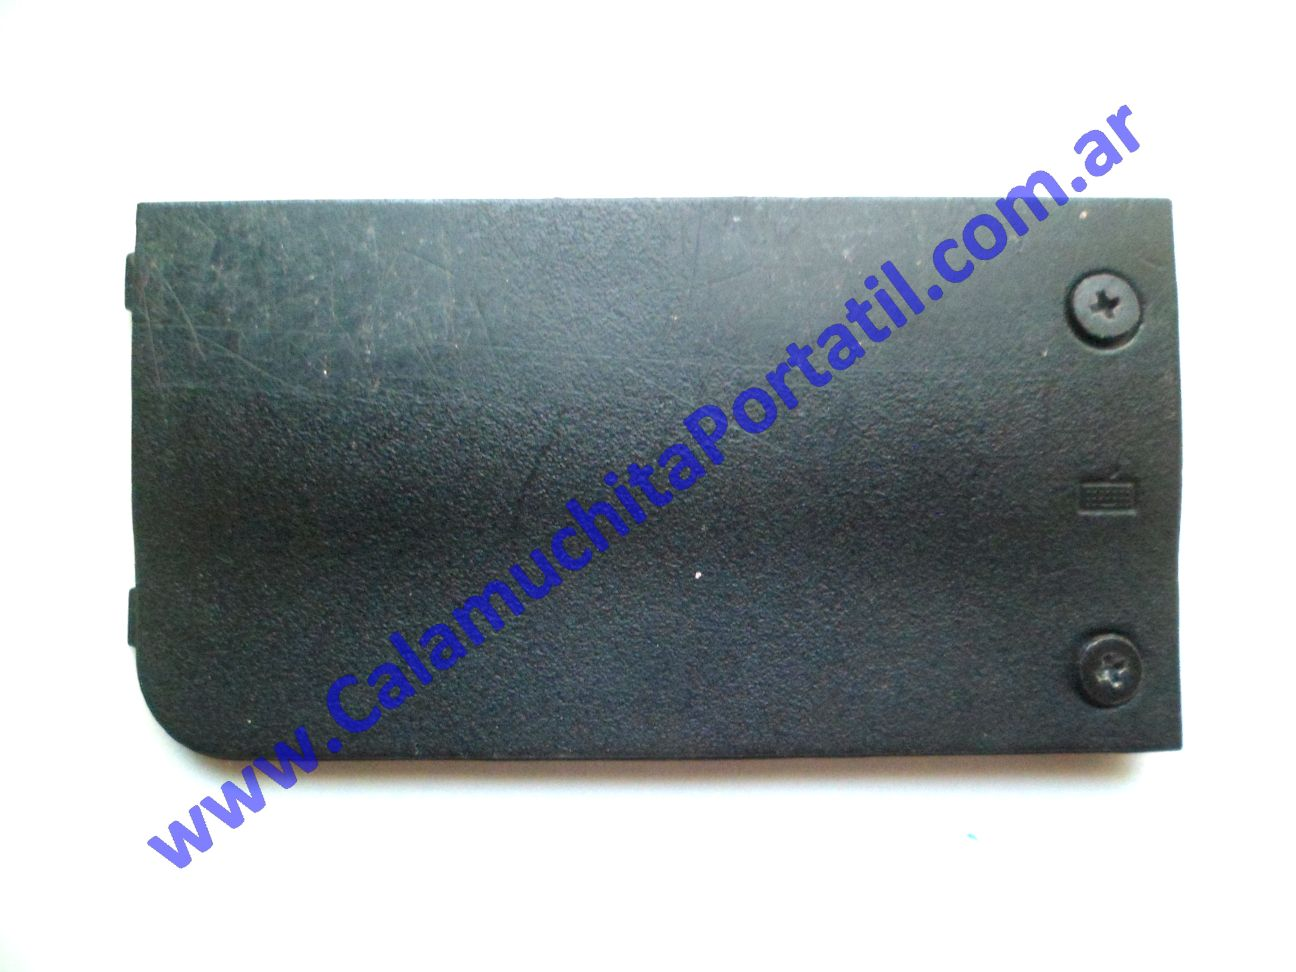 0564CTW Carcasas Tapa Wifi Compaq Presario CQ40-500LA / VD675LA#AC8